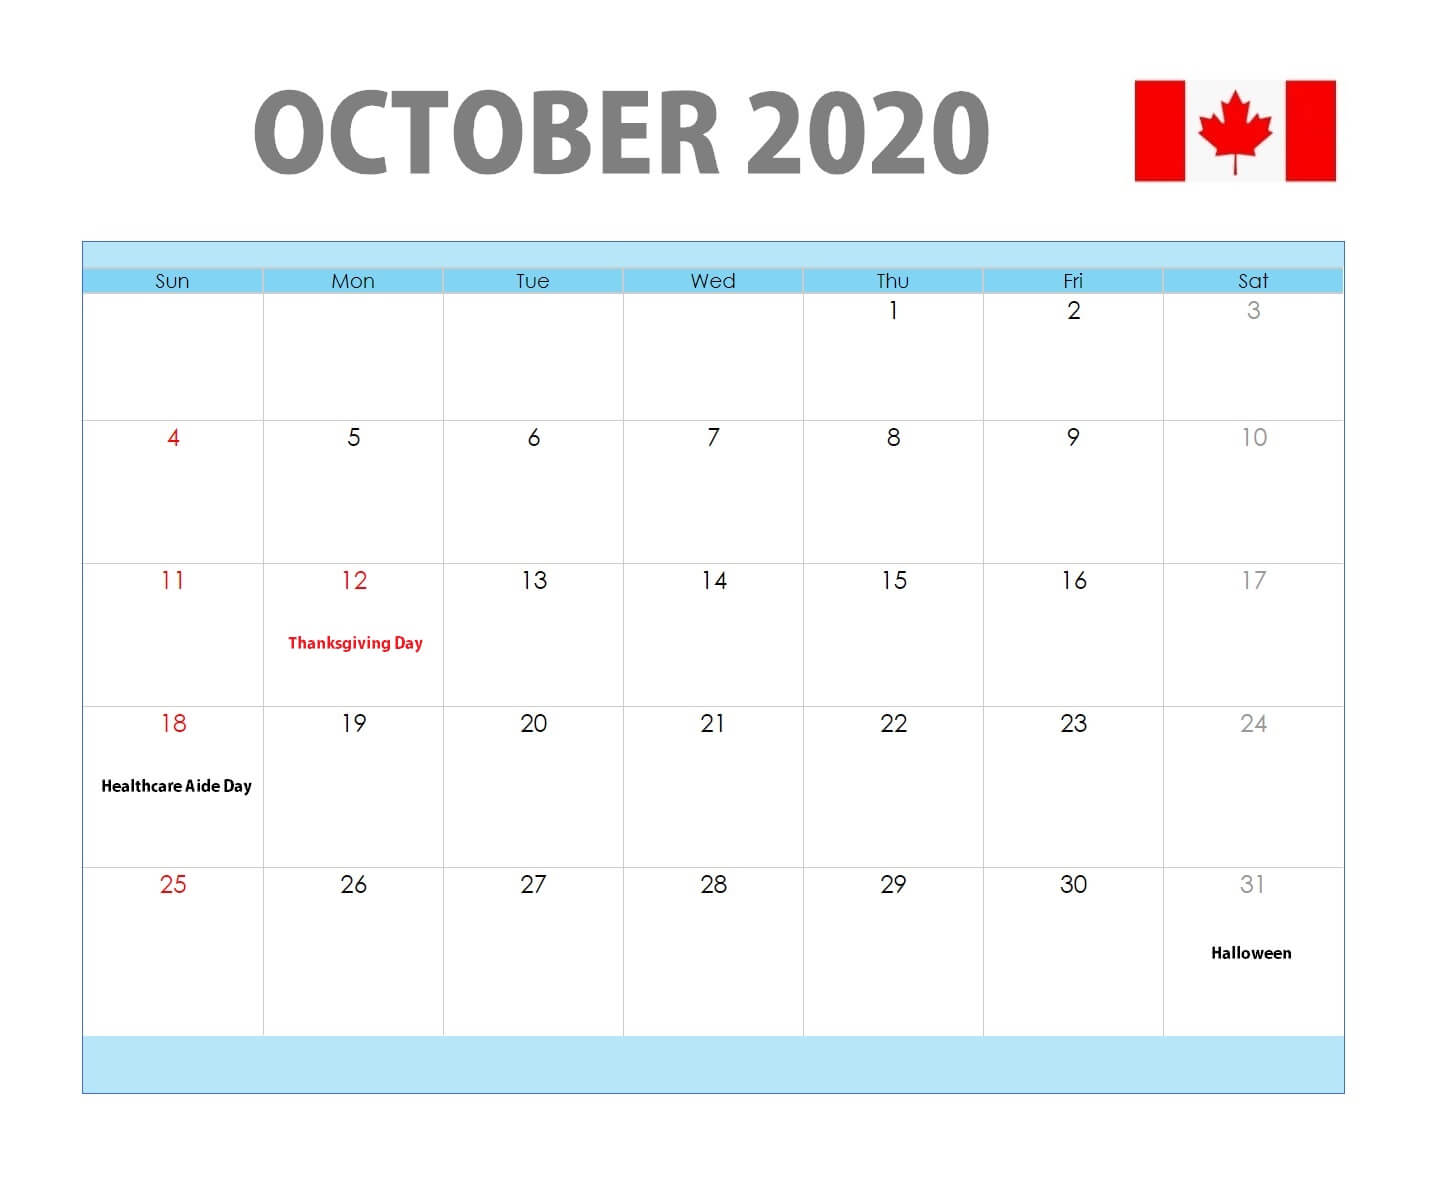 October 2020 Canada Holidays Calendar